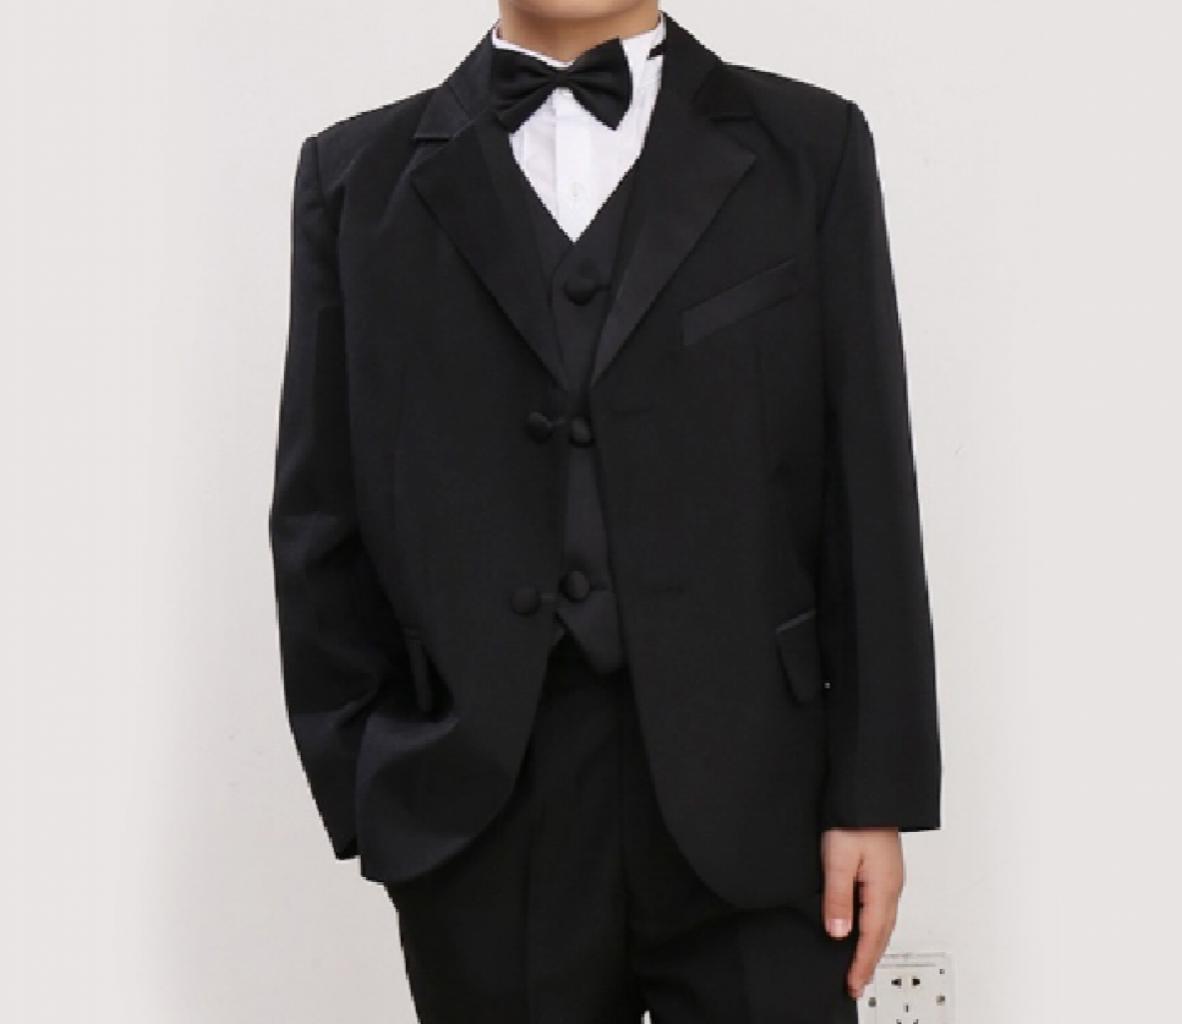 5 Pcs Infant Toddler Boy Formal Children Tuxedo Wedding Party Suit Black In Stan Affordable Pk